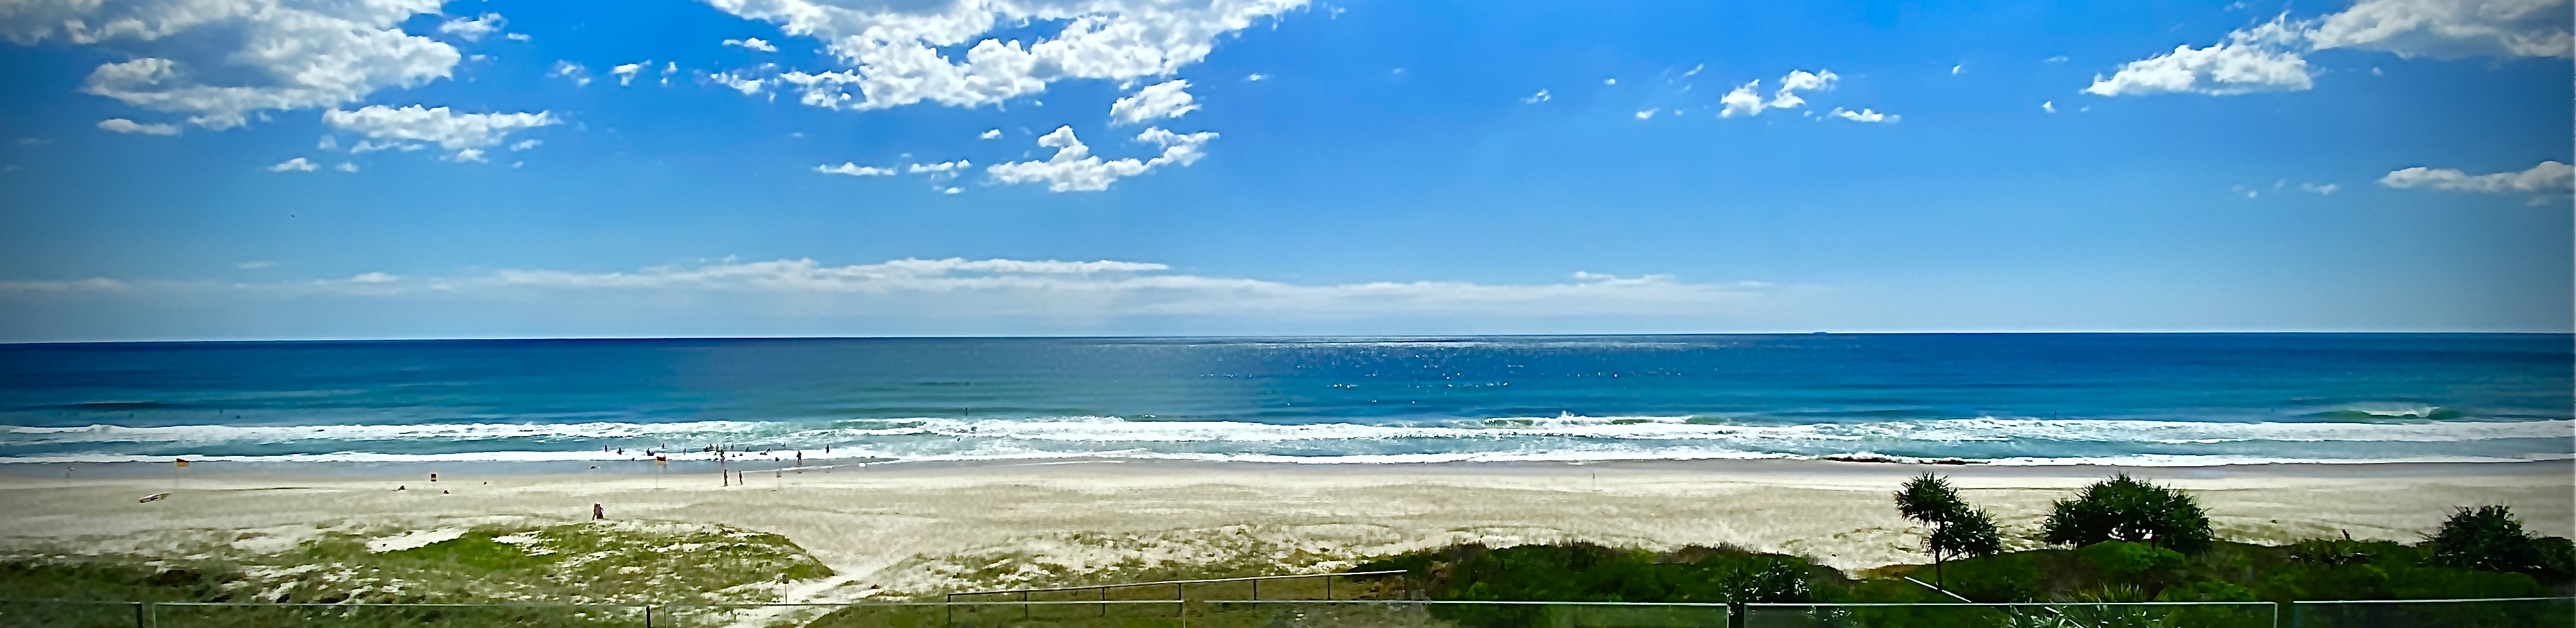 Australia - Gold Coast Chapter 1 1